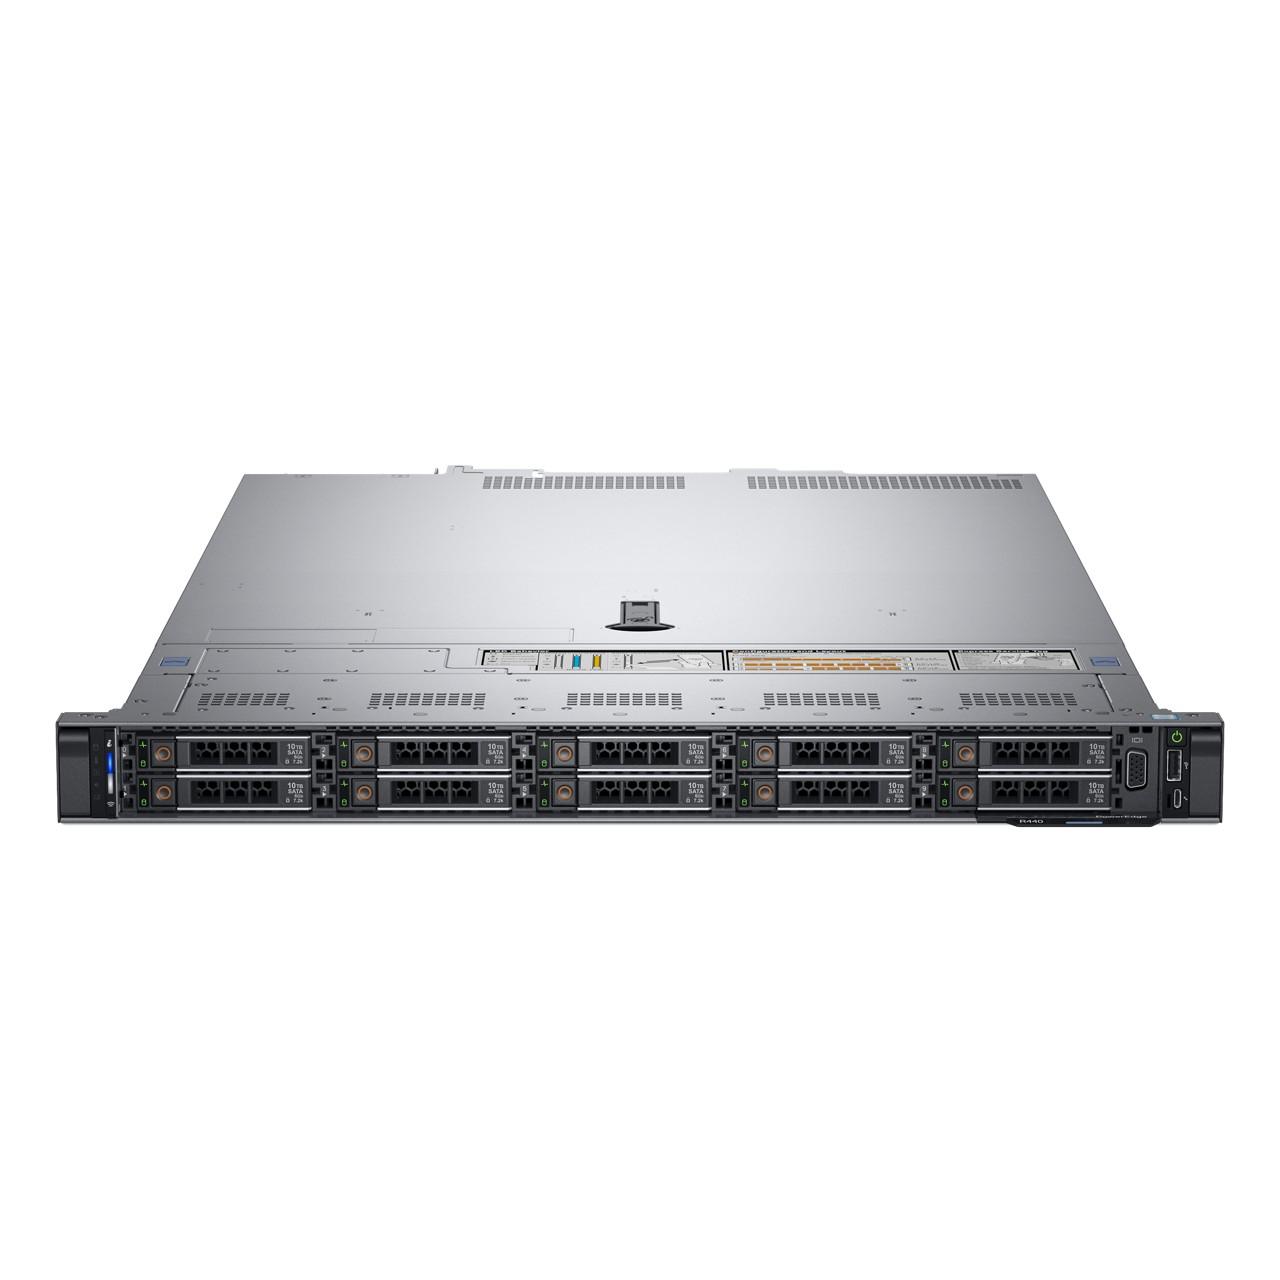 DELL PowerEdge R440 server 2.1 GHz Intel® Xeon® 4110 Rack (1U) 550 W